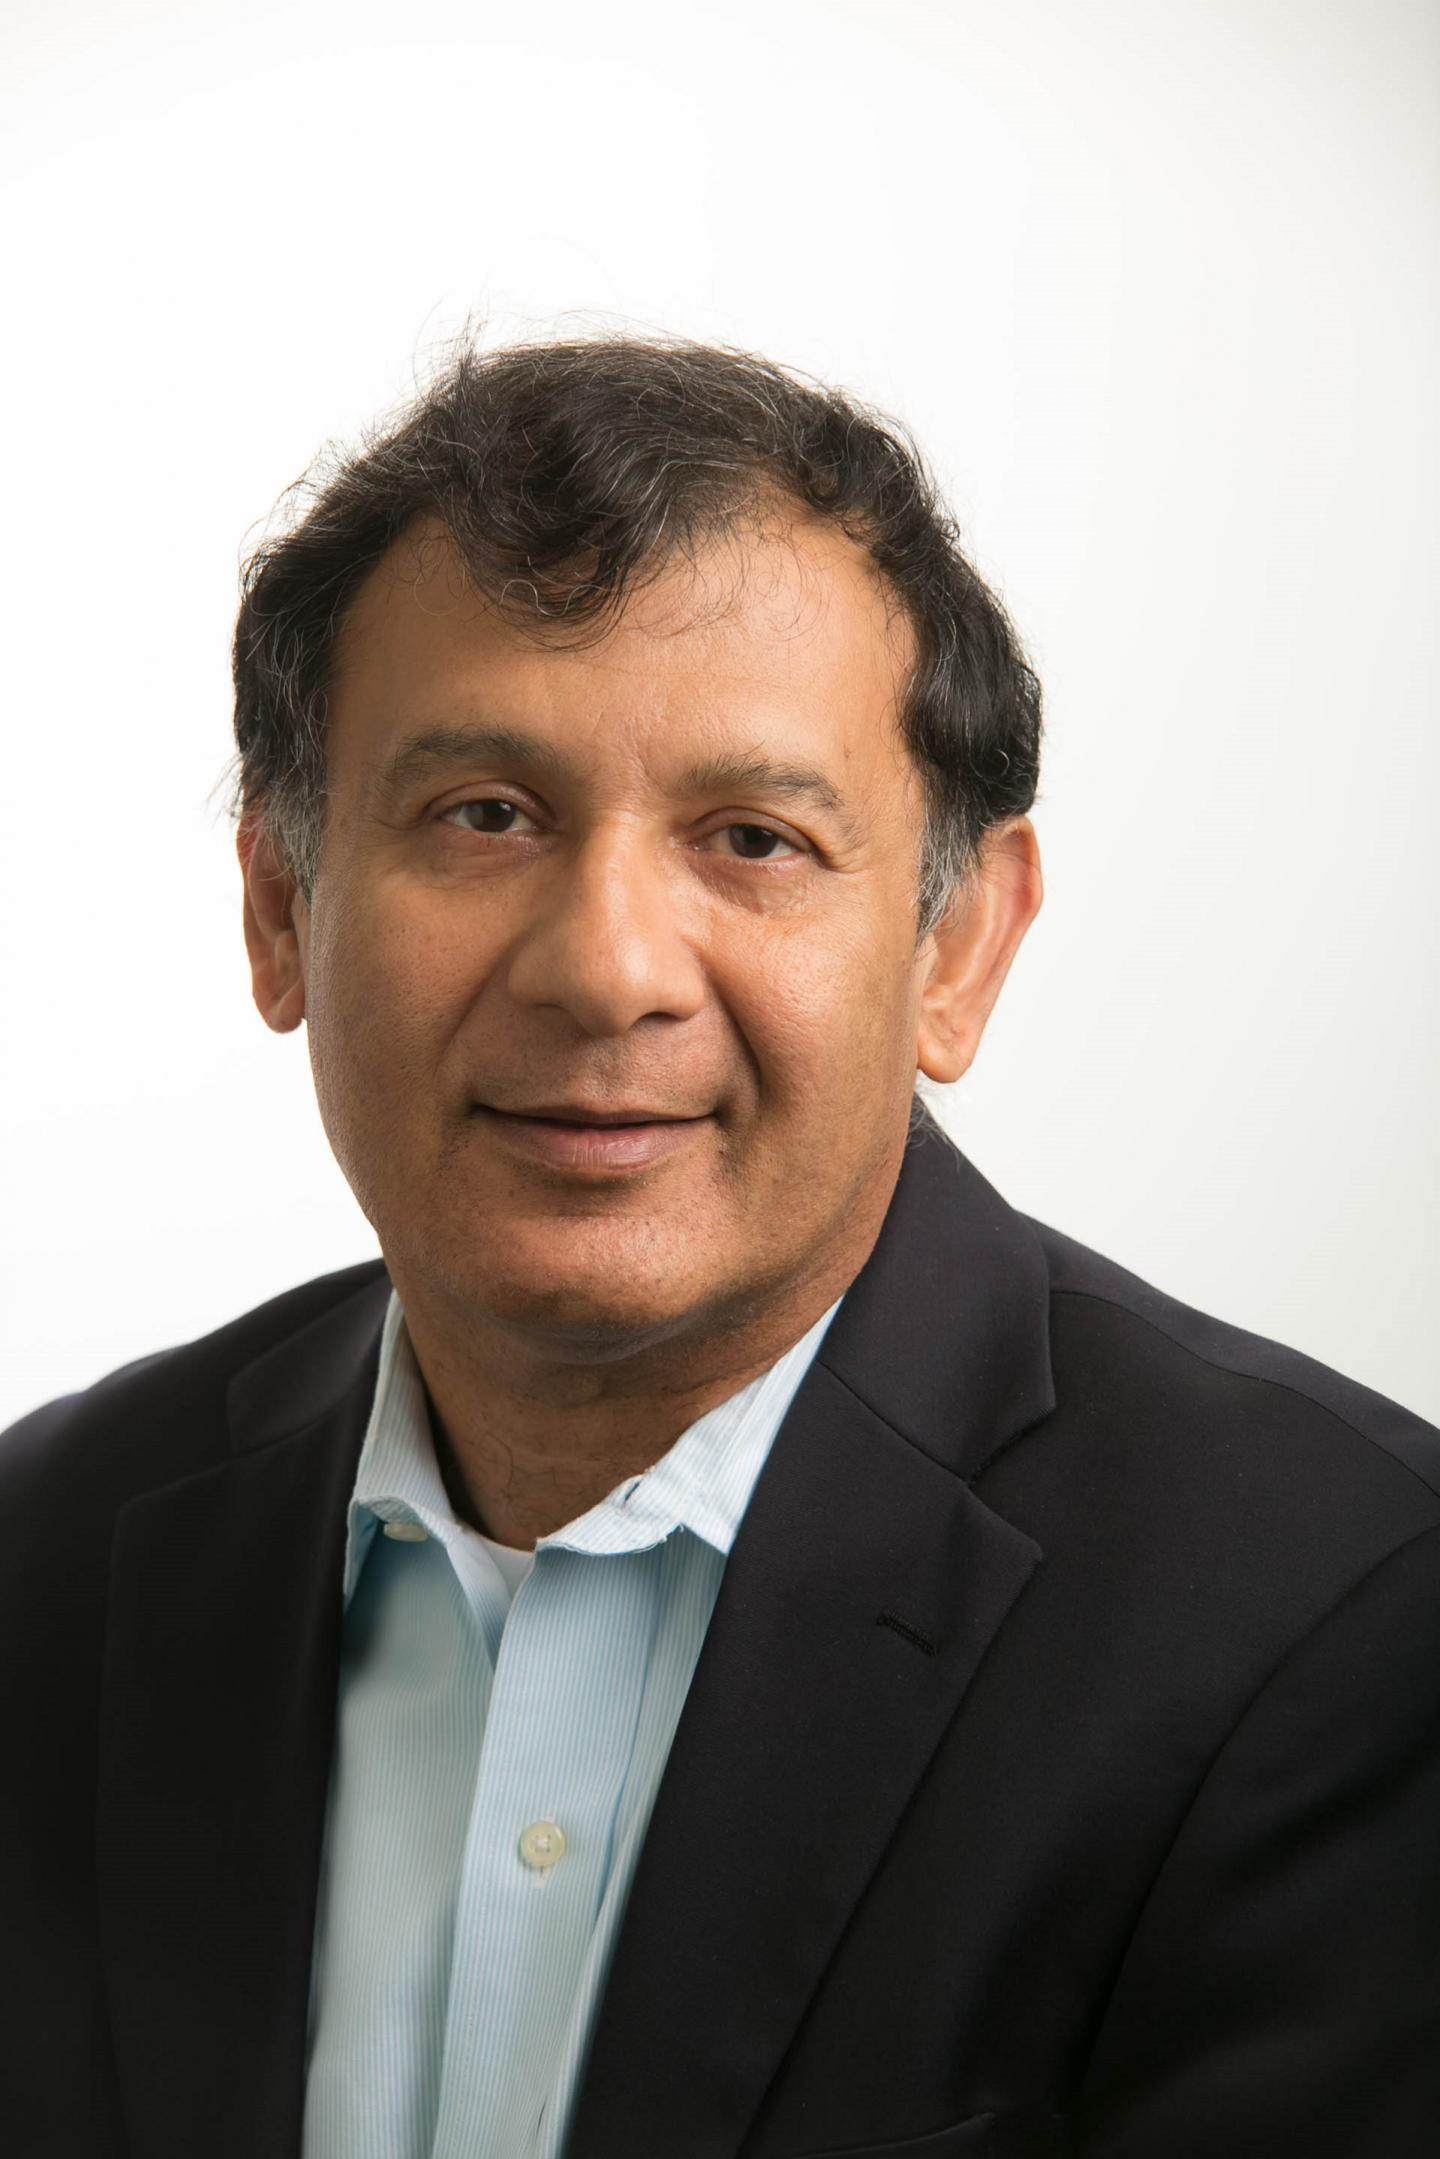 Praveen Kumar, University of Houston